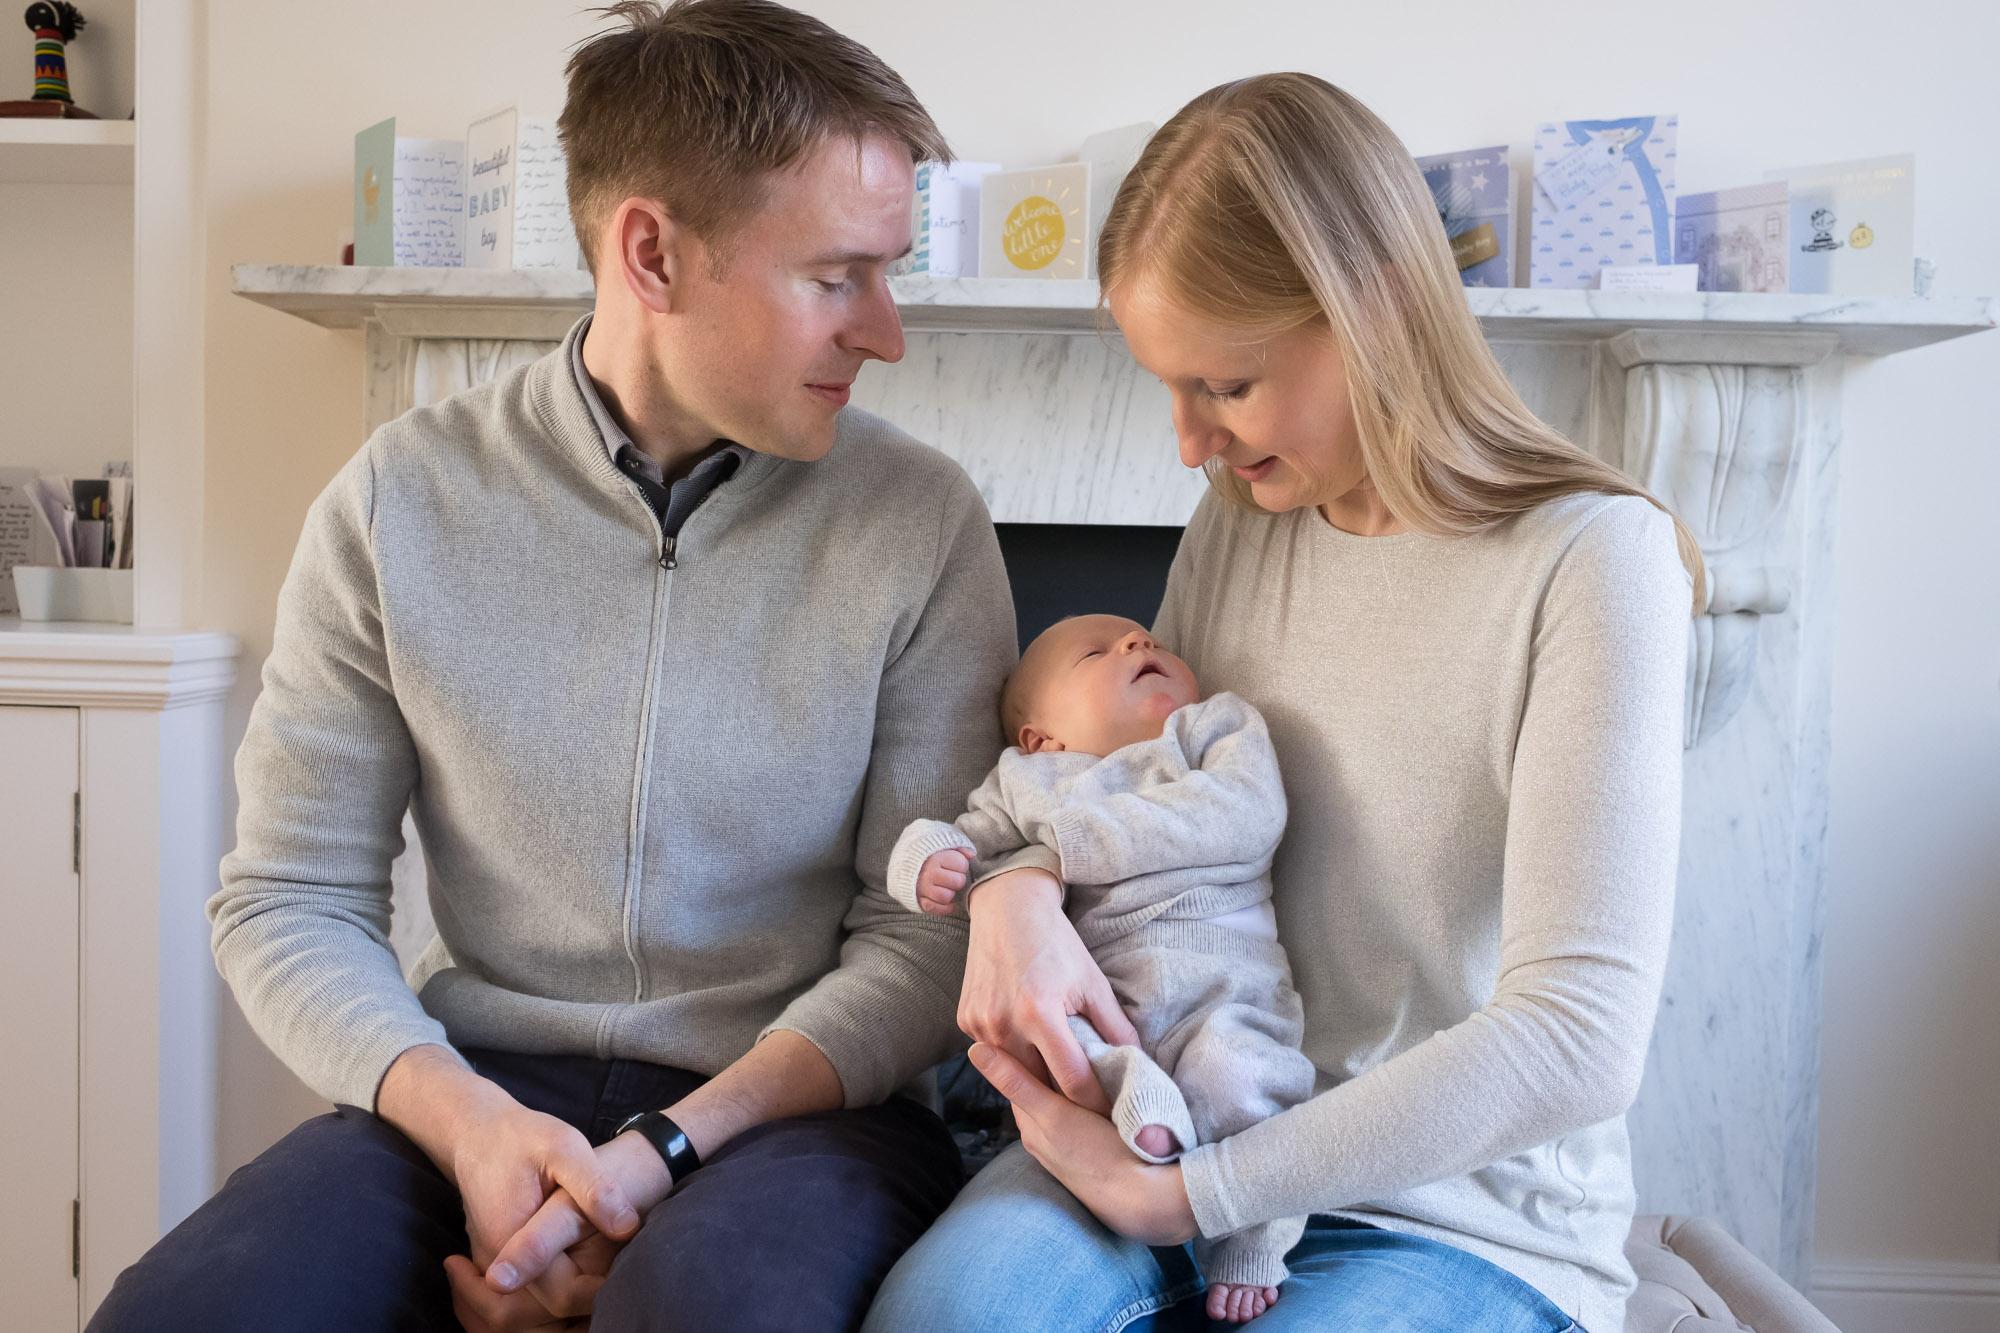 family-portrait-baby-photographer-117.jpg